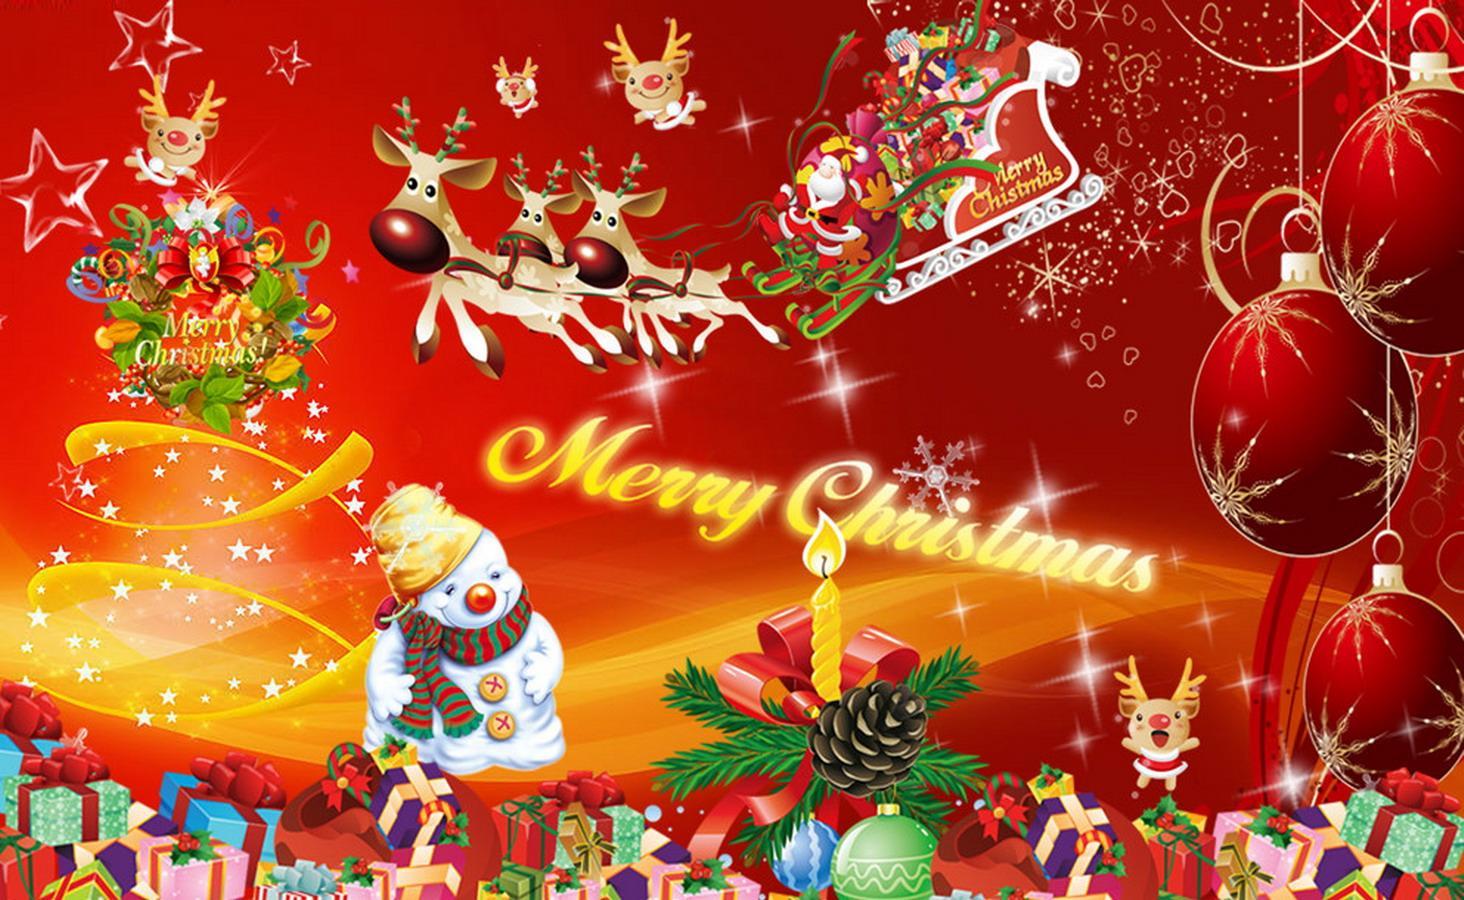 Christmas wallpaper hd for desktop - Christmas Wallpaper Screenshot